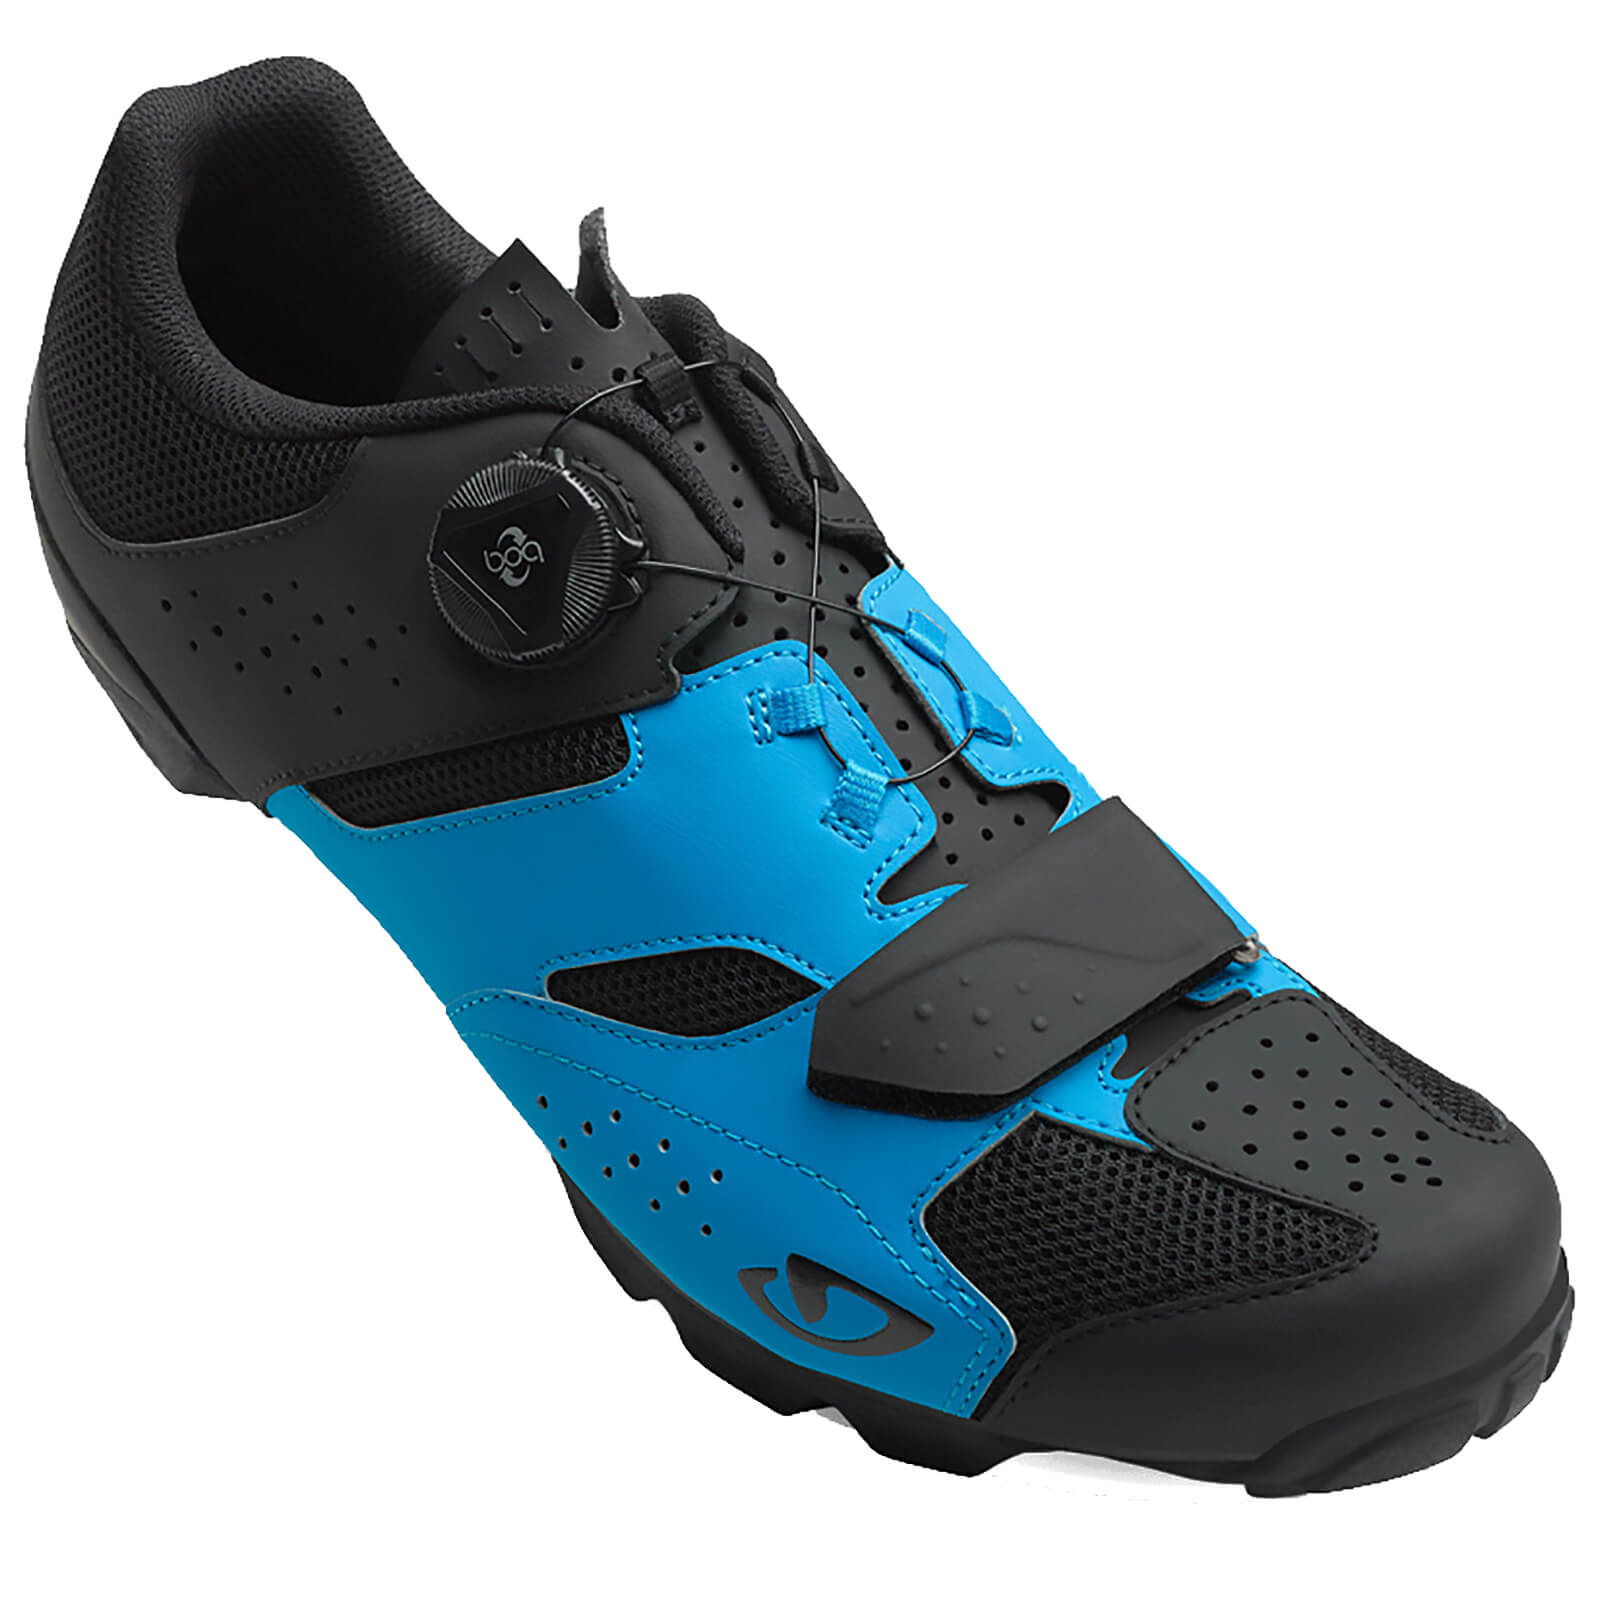 084ad642ecd Giro Cylinder MTB Cycling Shoes - Blue Black